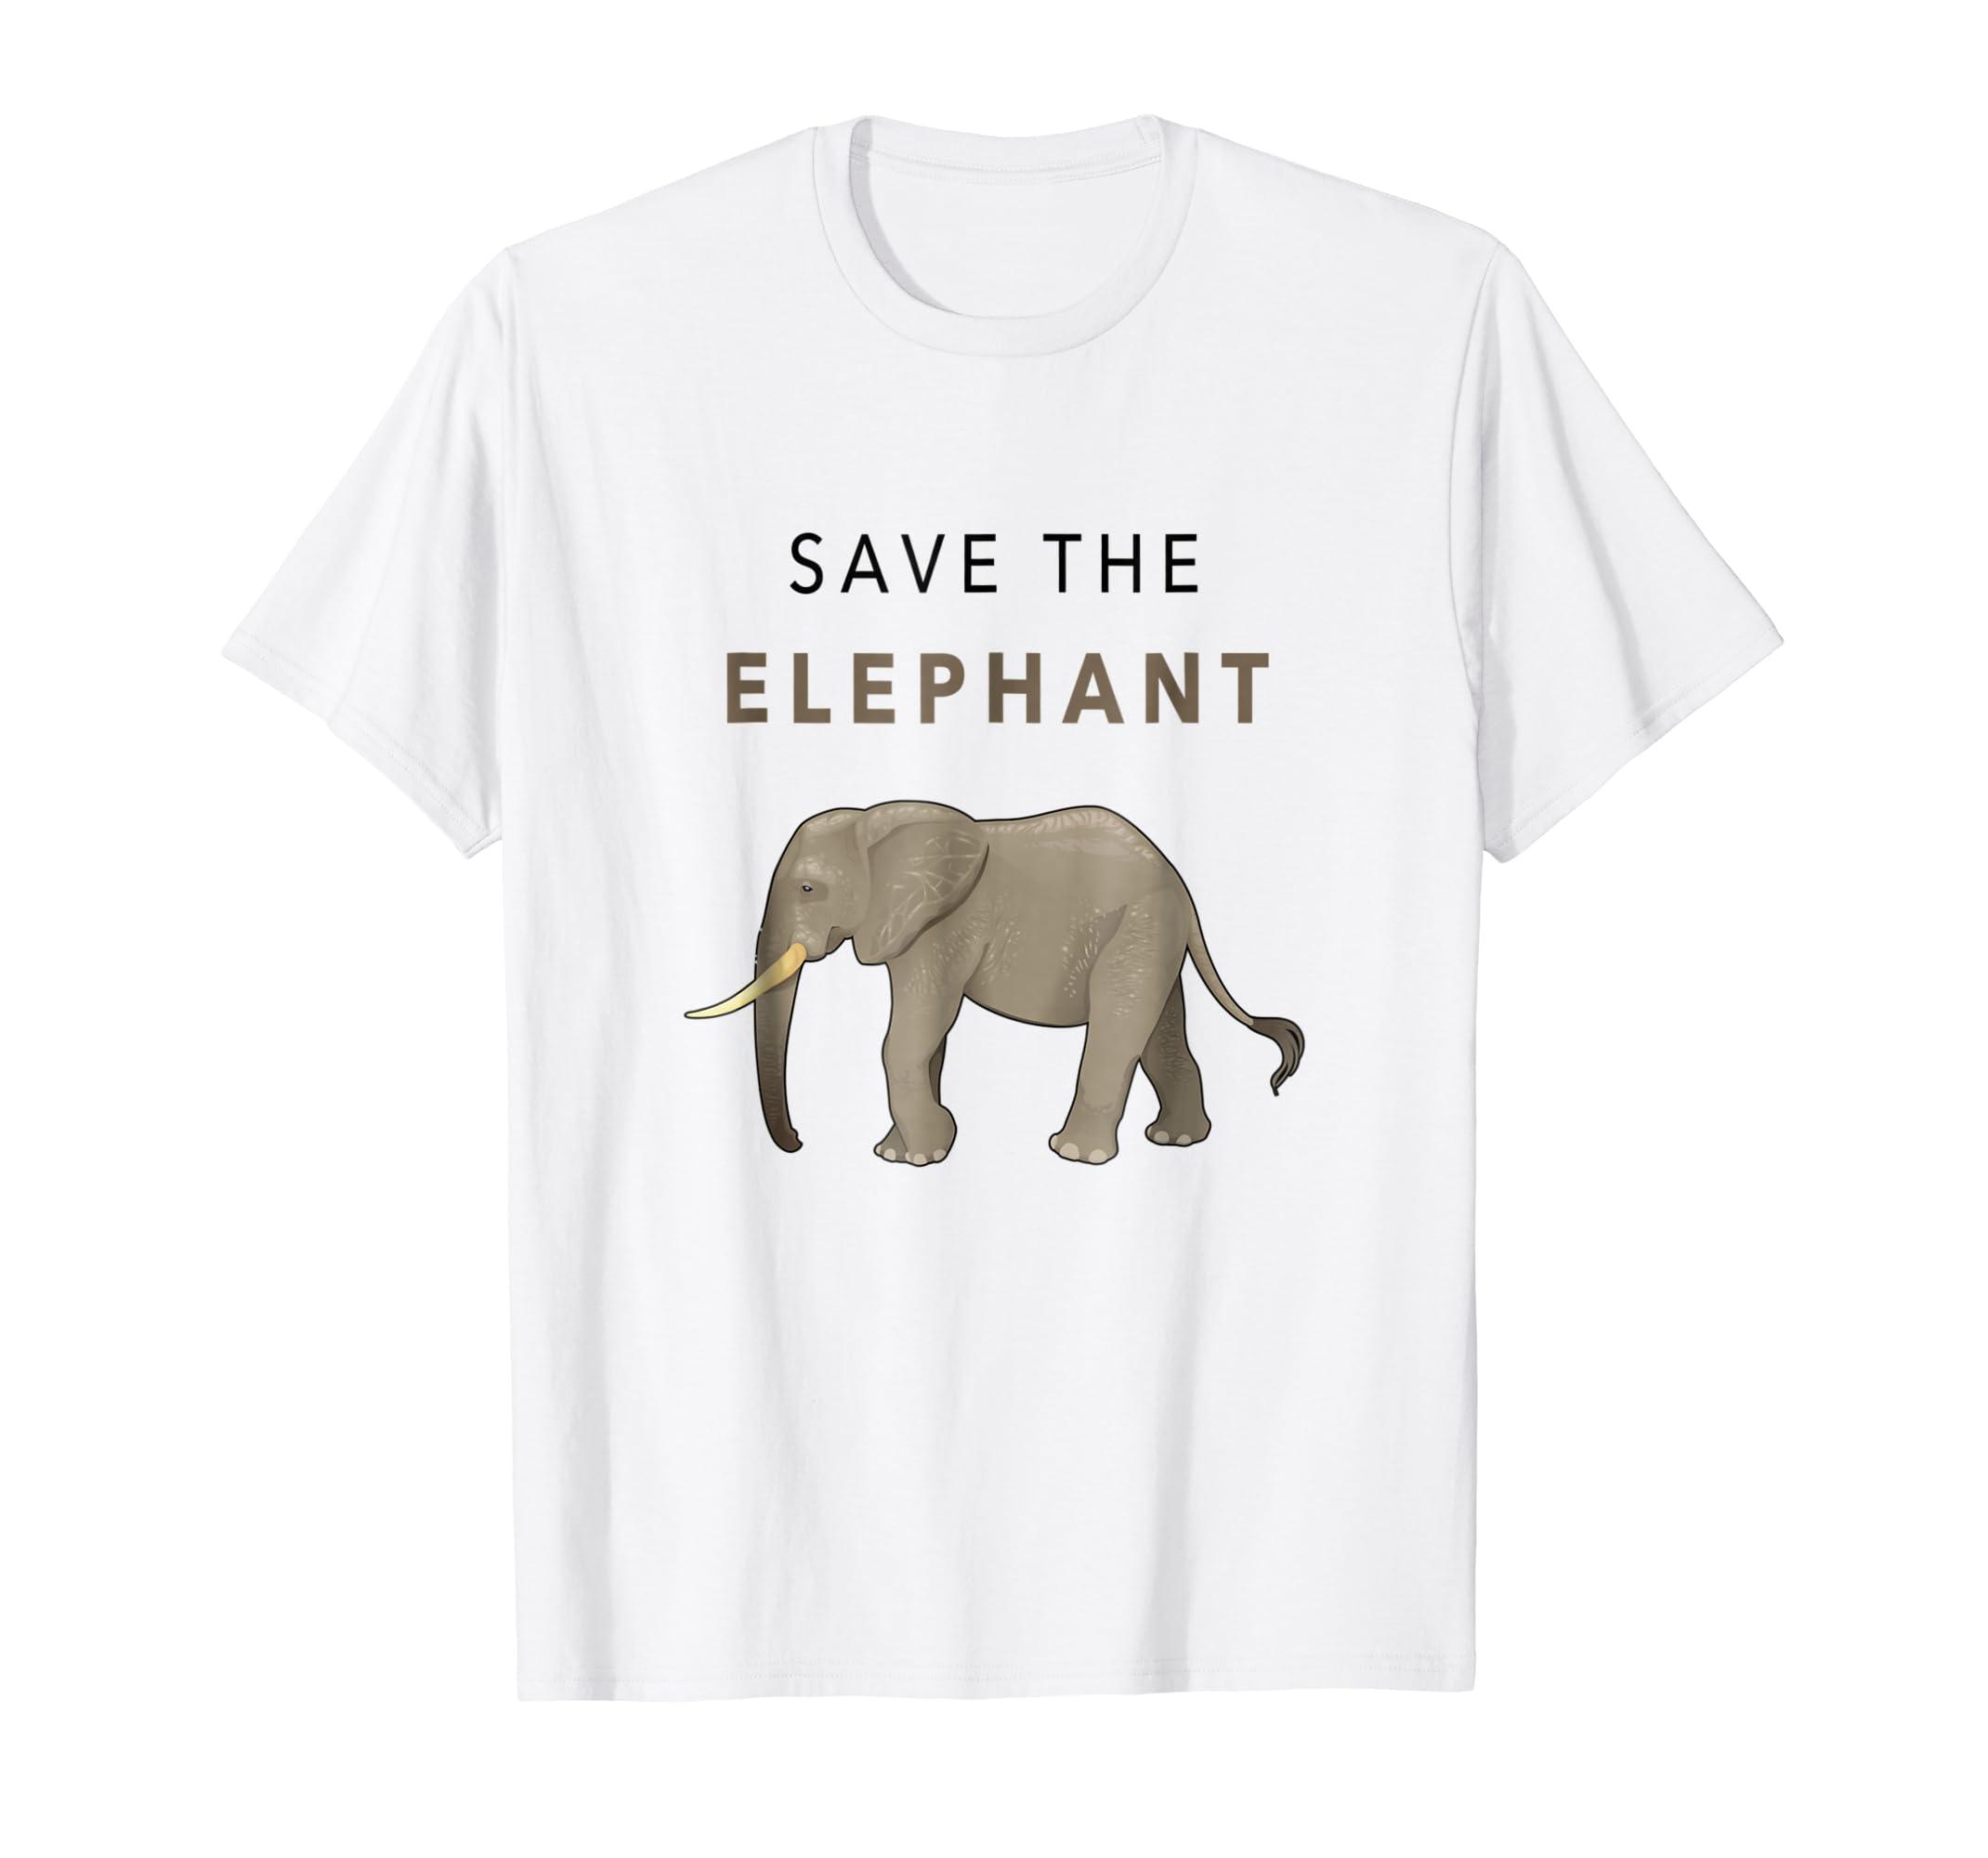 4c8e1d184 Amazon.com  Save The Elephant Shirt - Animal Rights Activist T-shirt   Clothing